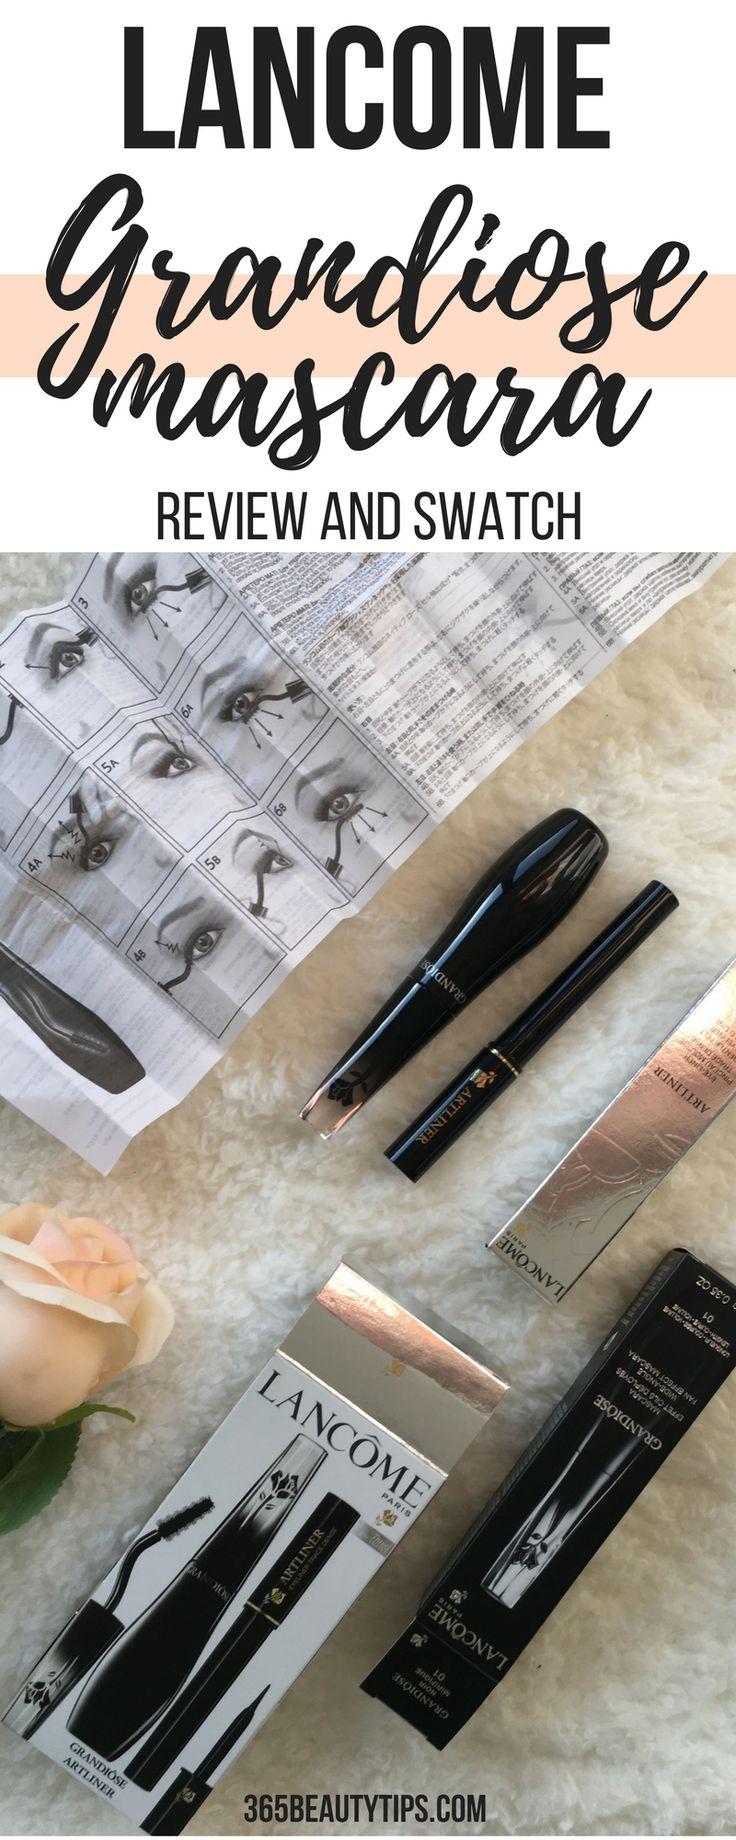 Lancome Grandiose #mascara - review and swatch. #makeup #review #lancome